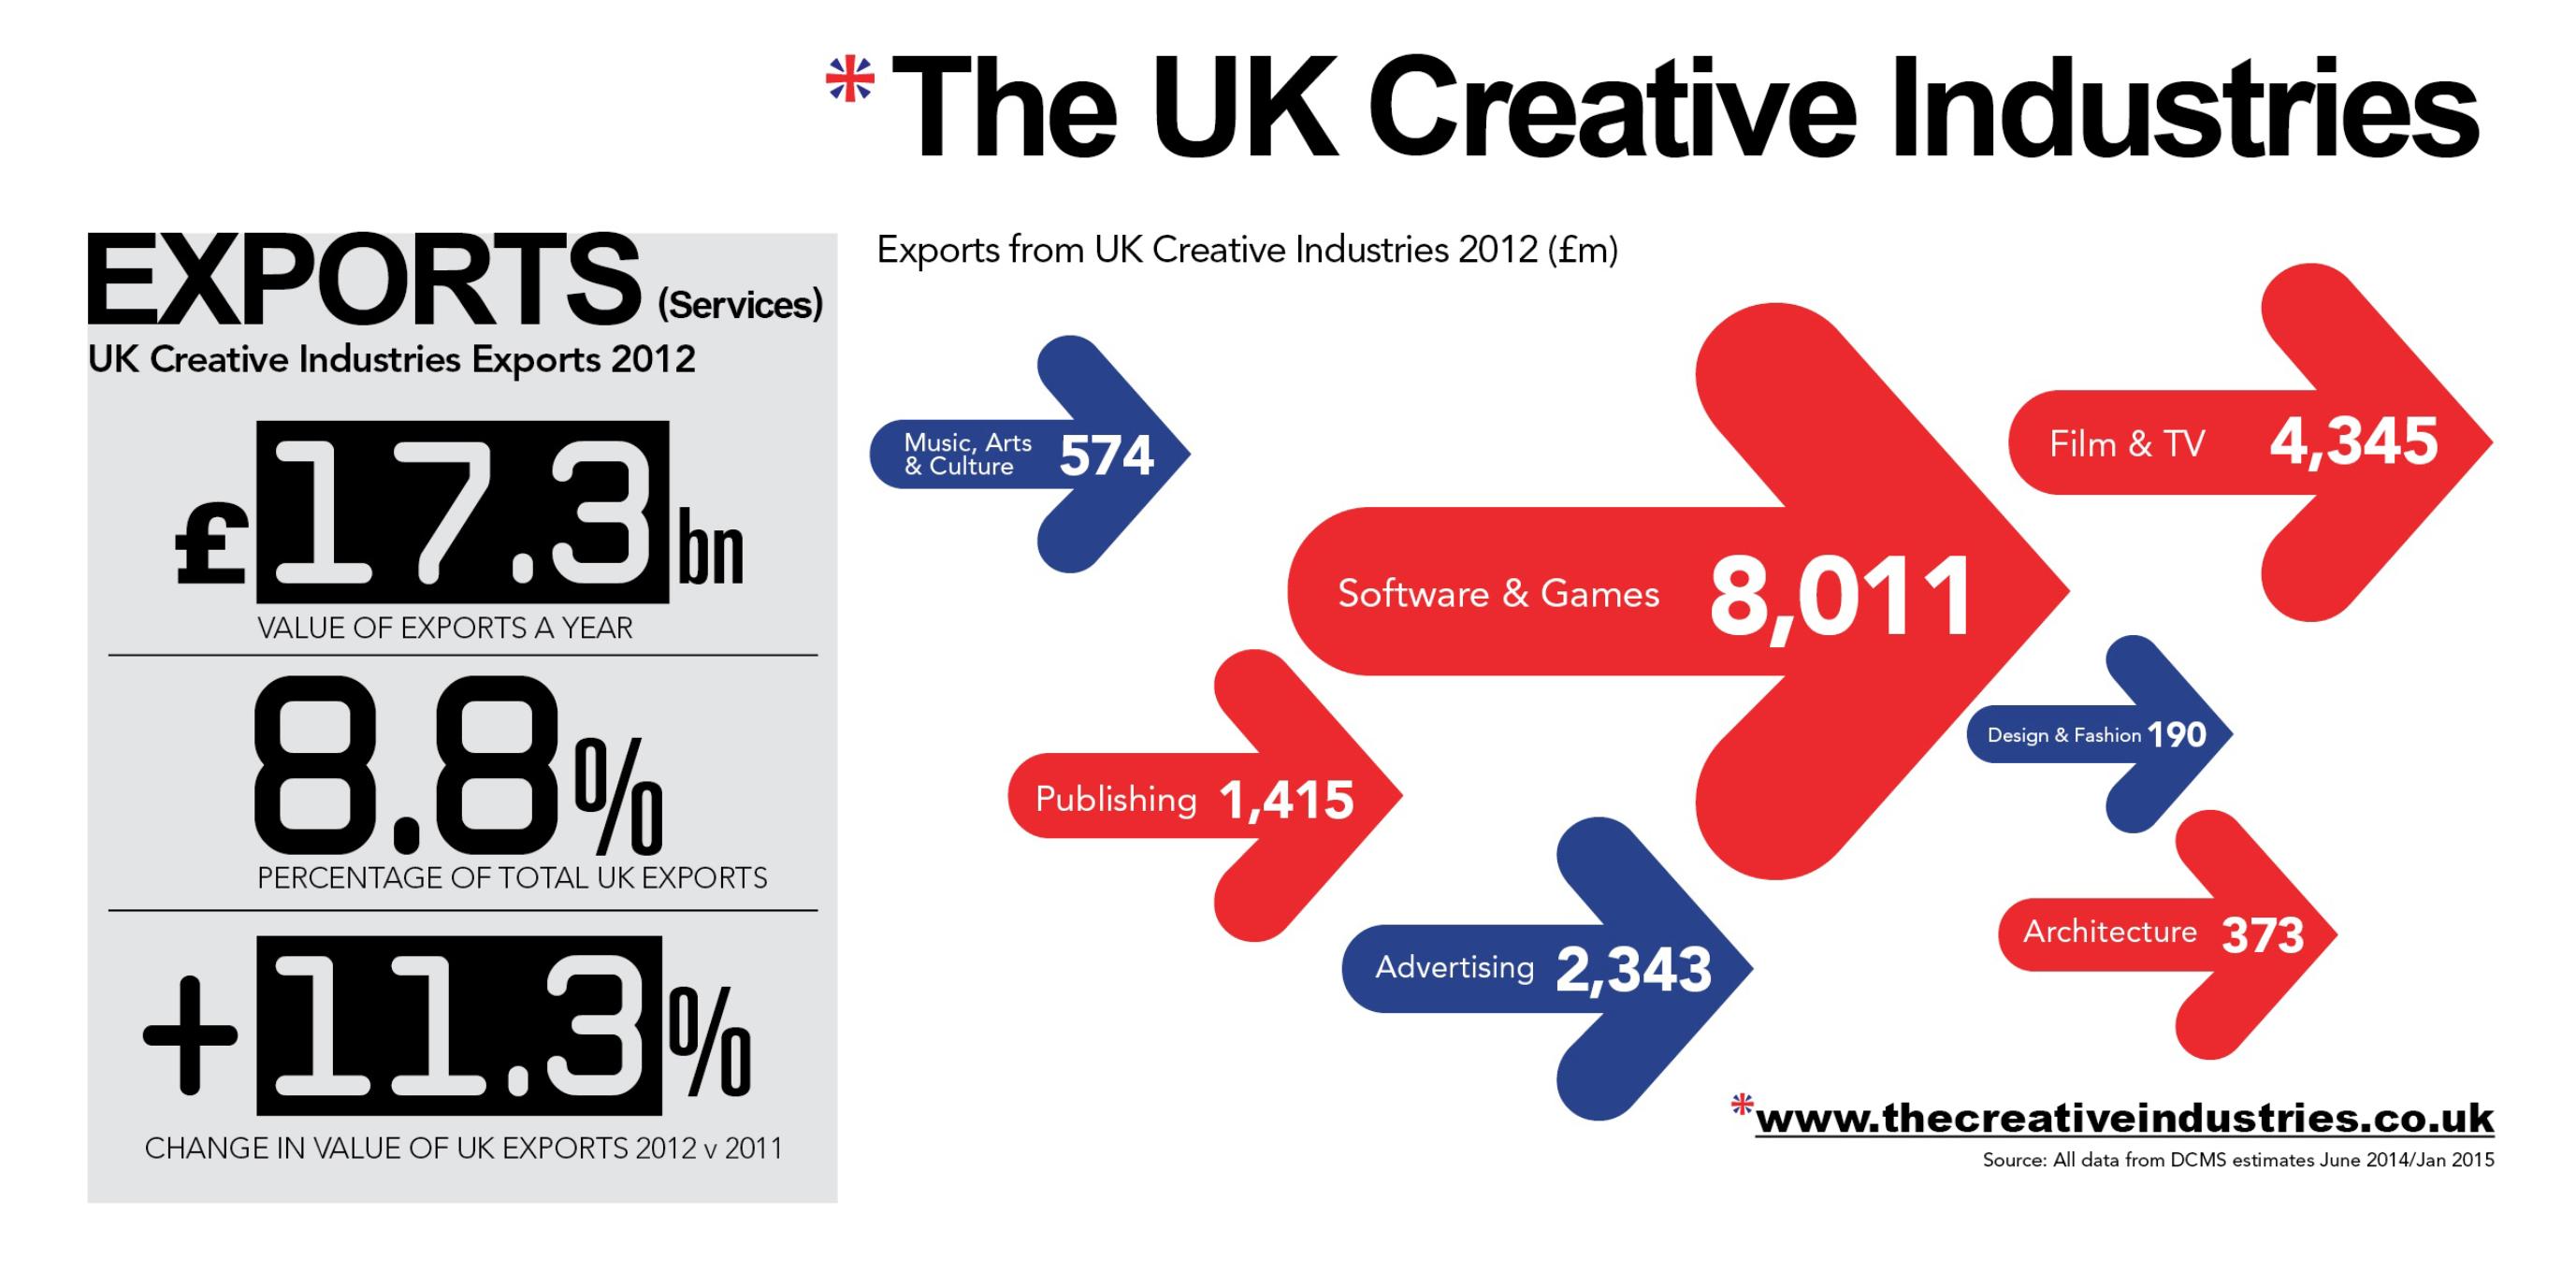 UK Creative Industries Exports